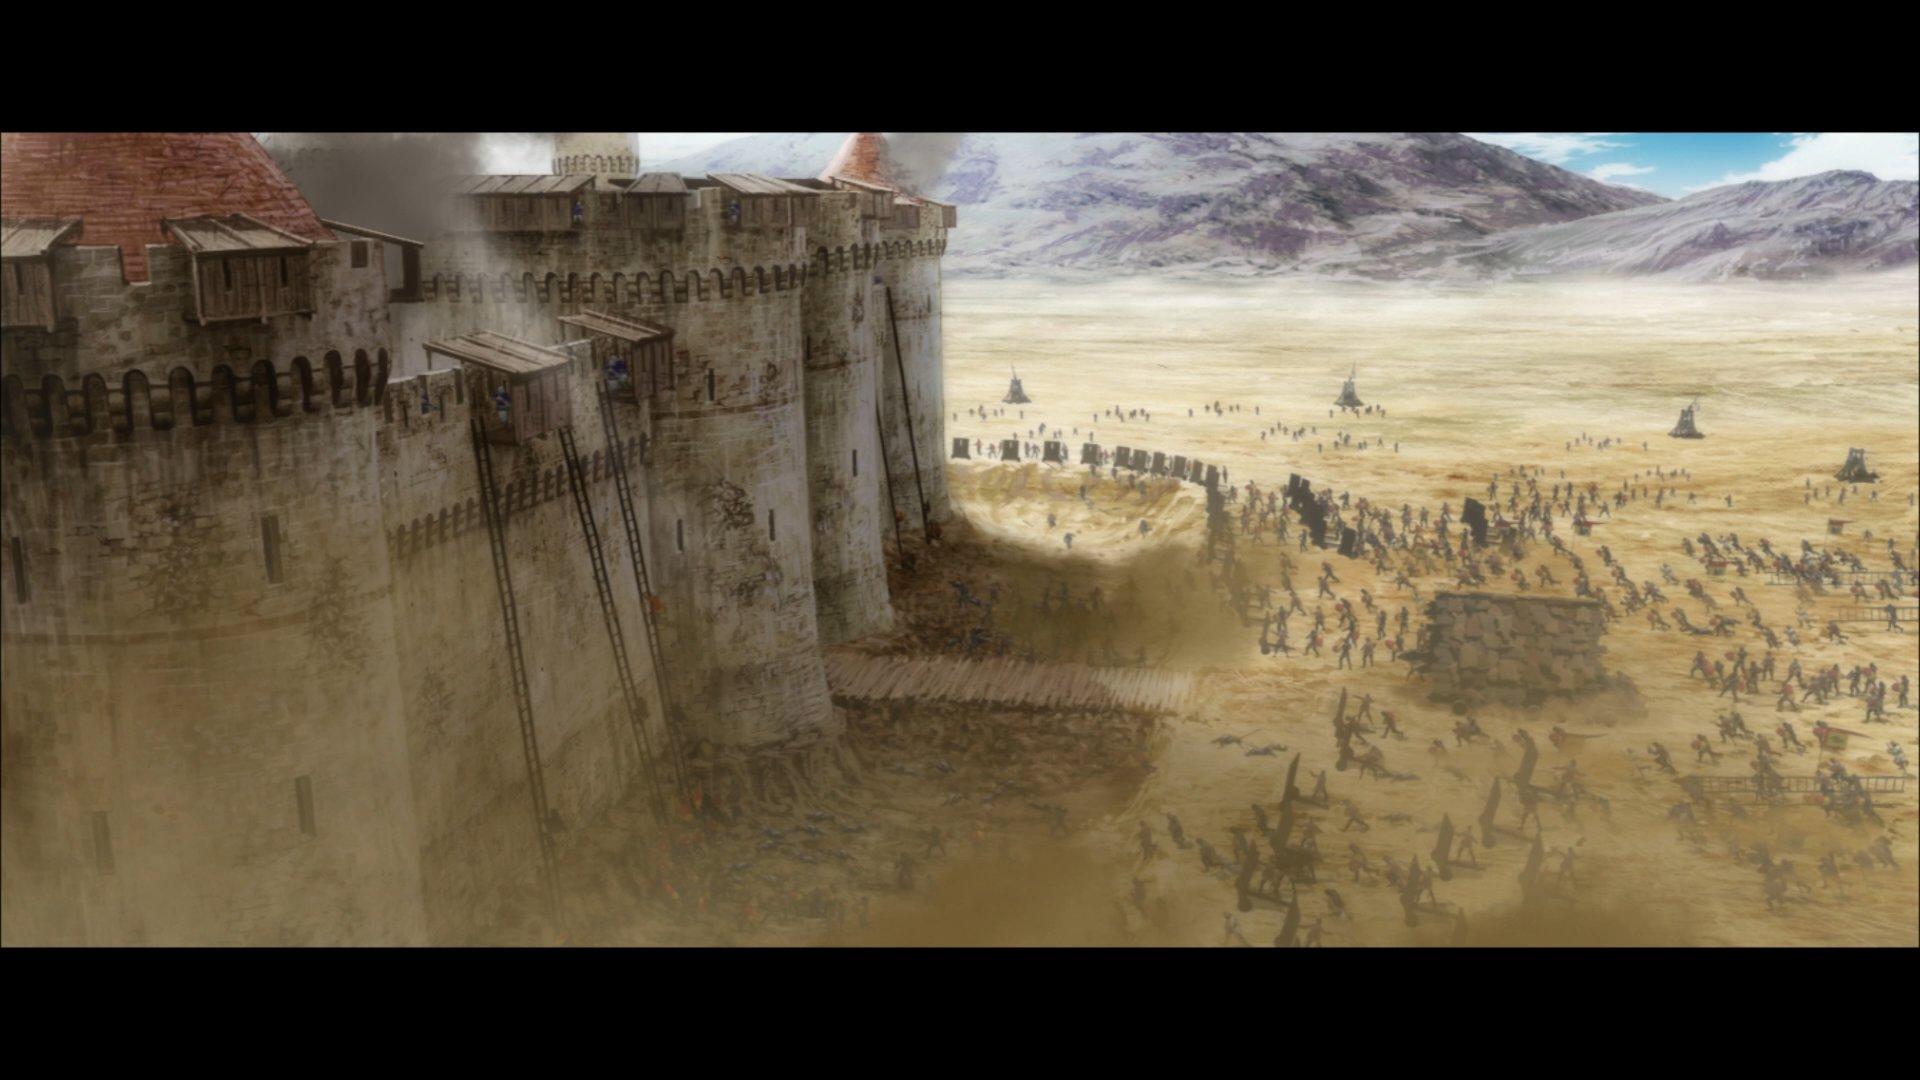 Berserk - Das goldene Zeitalter 1